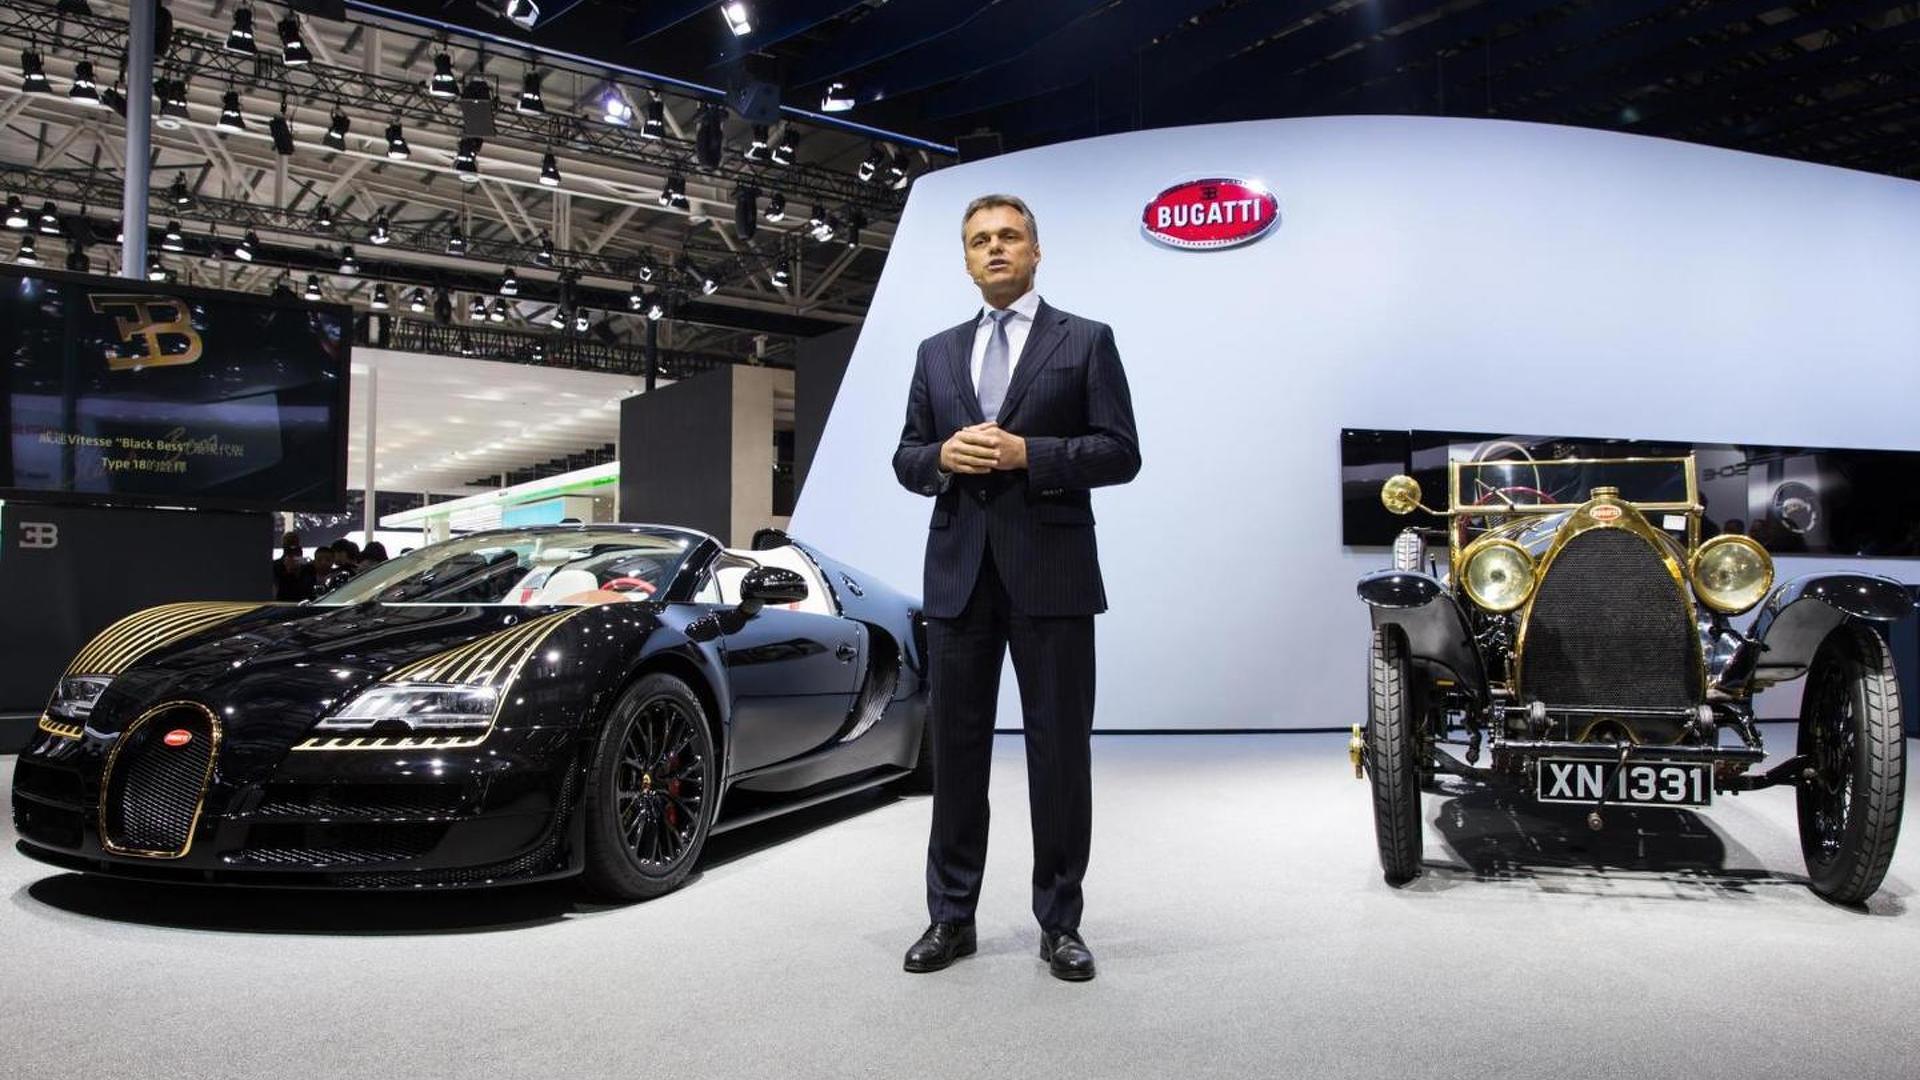 2014-470207-bugatti-veyron-grand-sport-vitesse-black-bess-live-at-auto-china1 Breathtaking Bugatti Veyron Black Bess Price Cars Trend